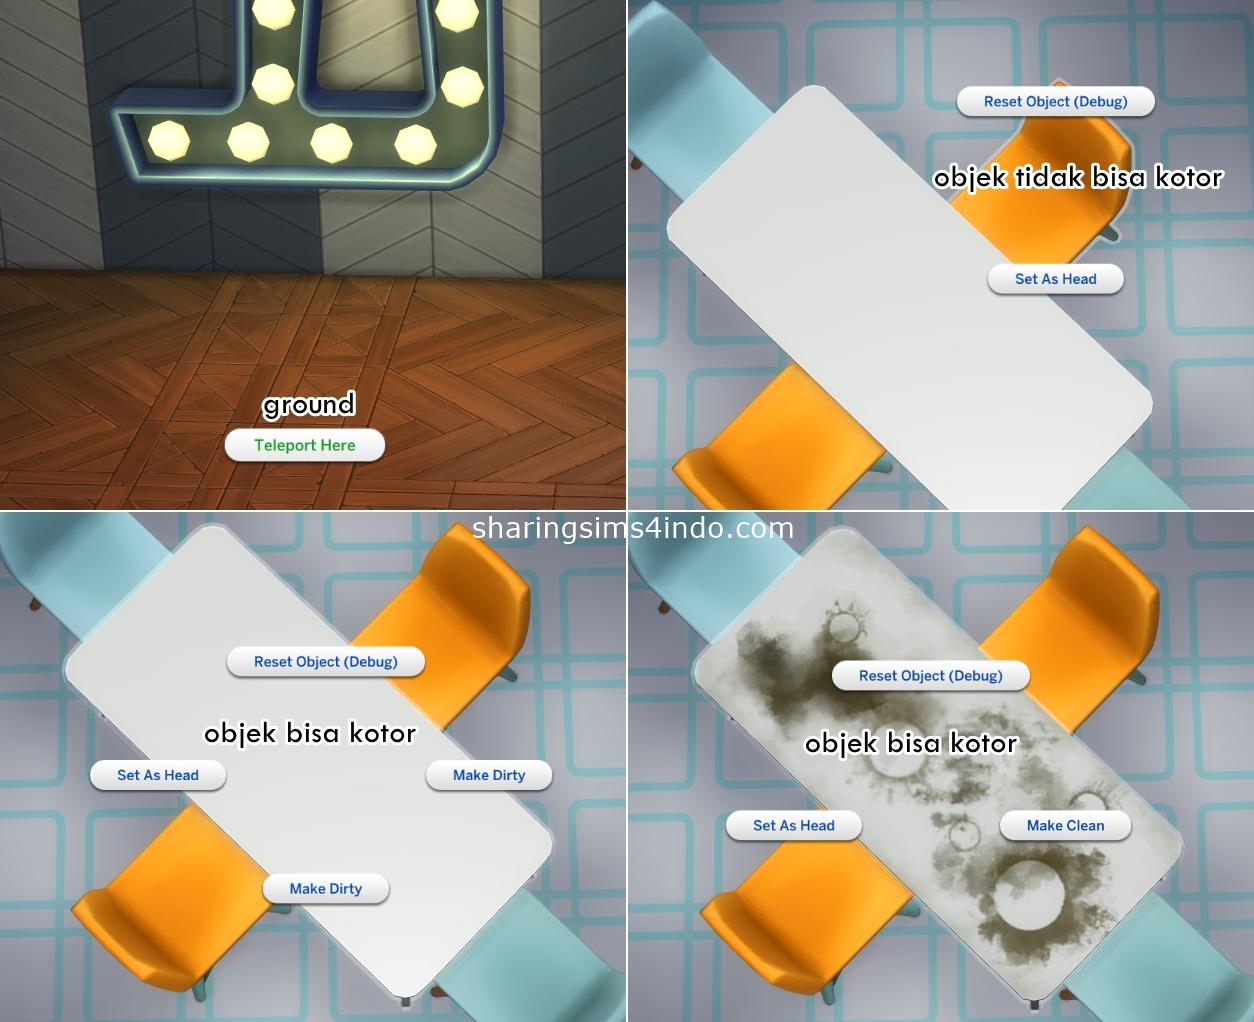 Baru Daftar Cheat Sims 4 Lengkap Versi Bahasa Indonesia Sharingsims4indo